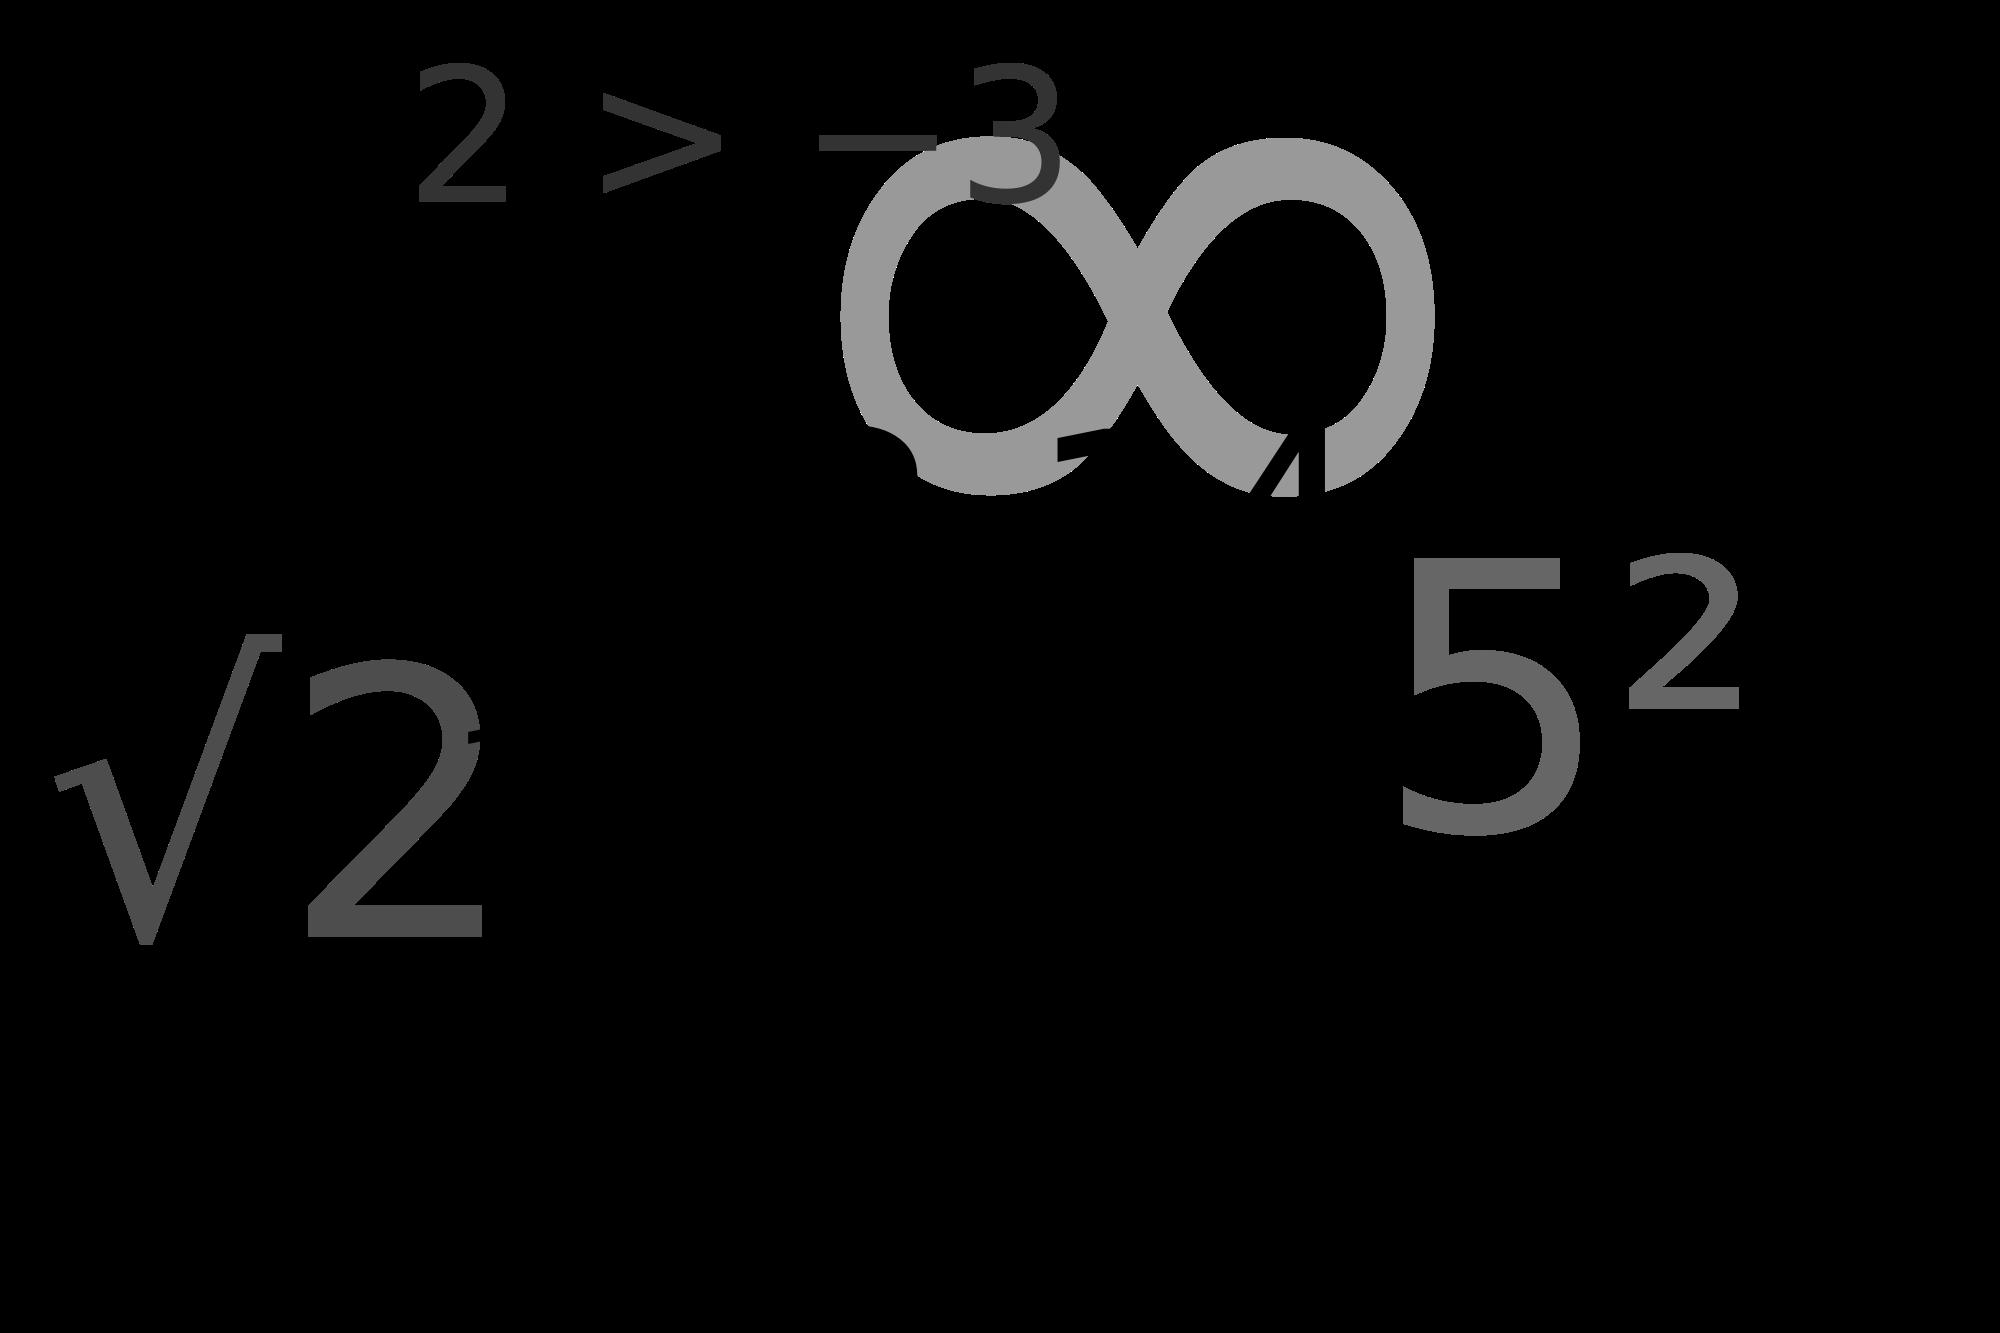 Multiplication clipart mathematics wallpaper. Symbol of maths images